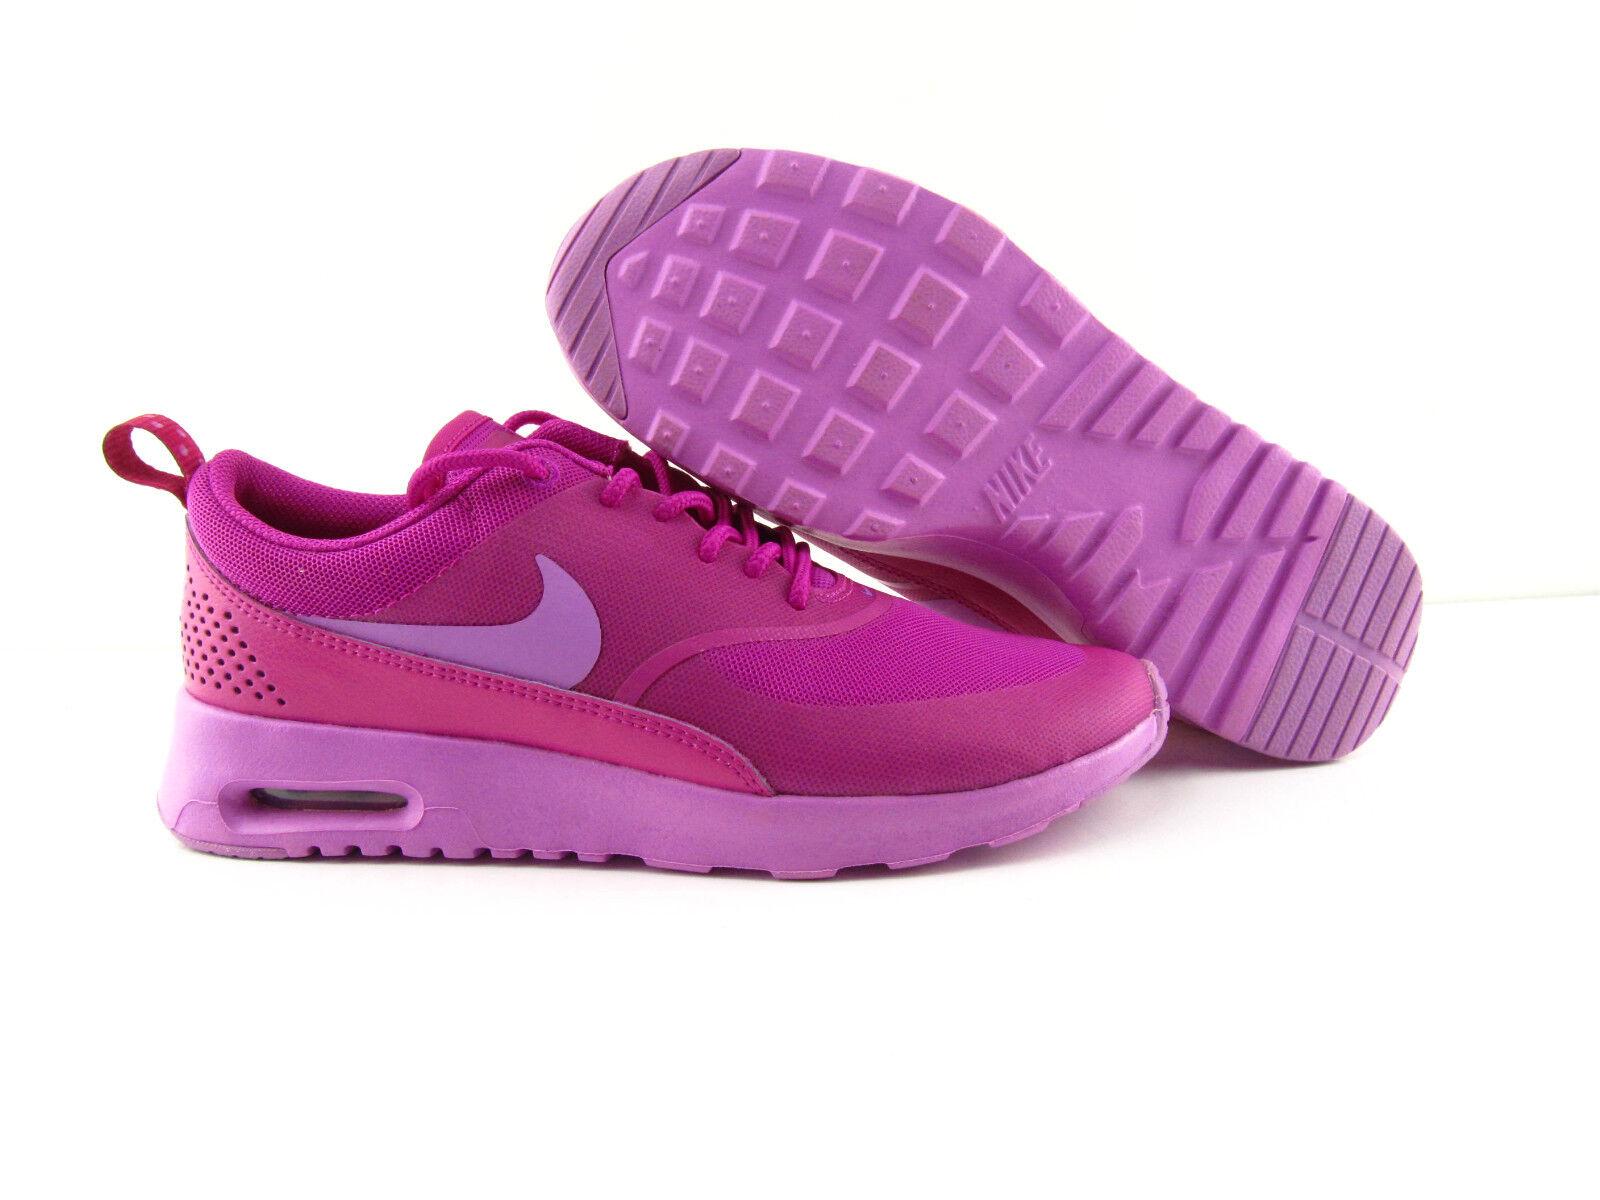 Nike Air Max 90 Thea Vivid  Violet  Fuchsia Flash Glow Sneakers Eur 36.5 - 37.5